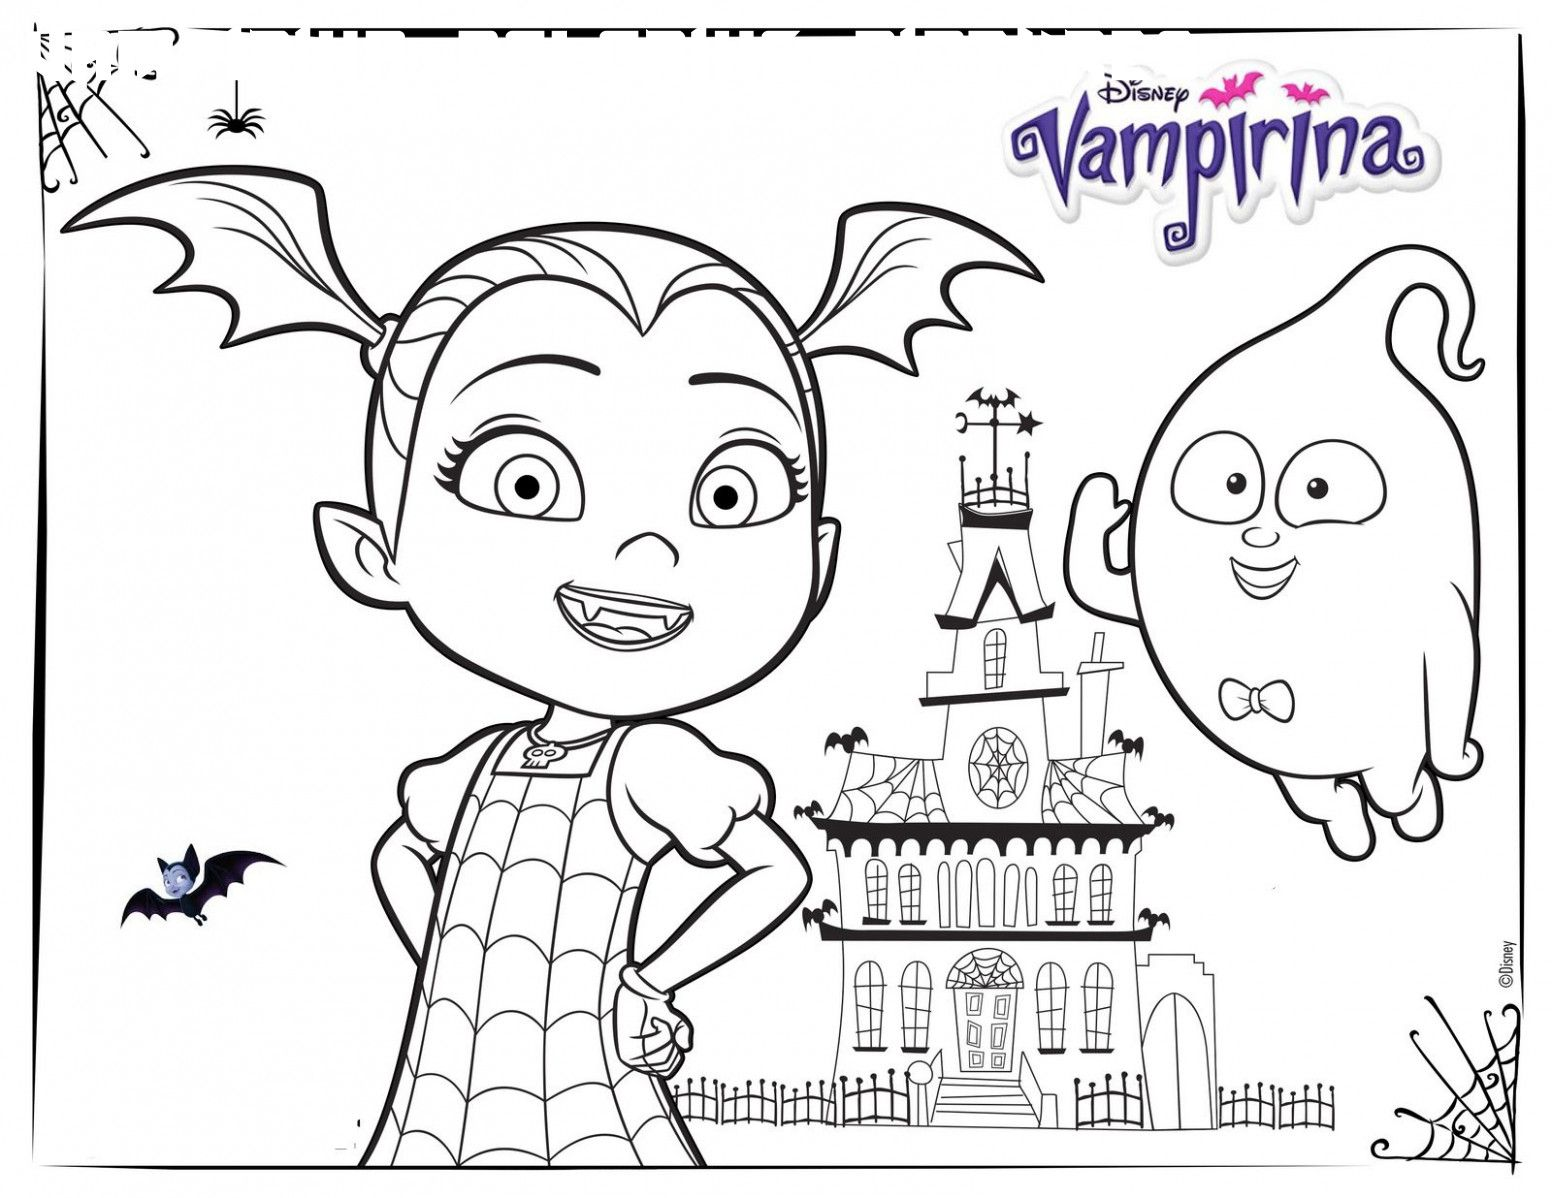 6 Vampirina Coloring Pictures In 2020 Disney Coloring Pages Halloween Coloring Pages Halloween Coloring